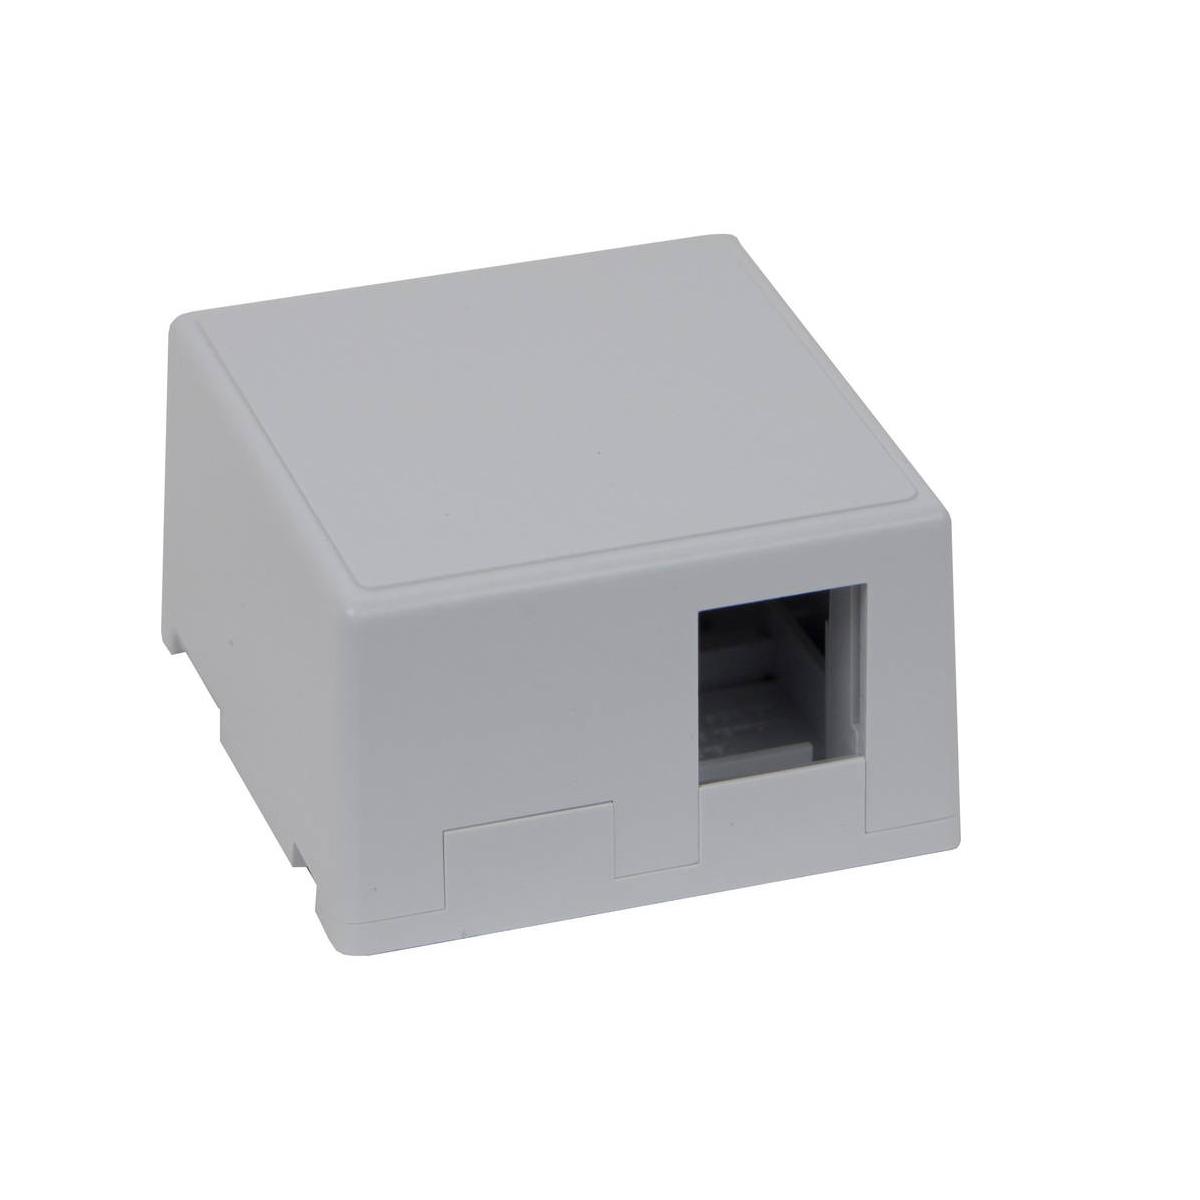 Exel 1 e 2 Portas Keystone Surface Mont Box